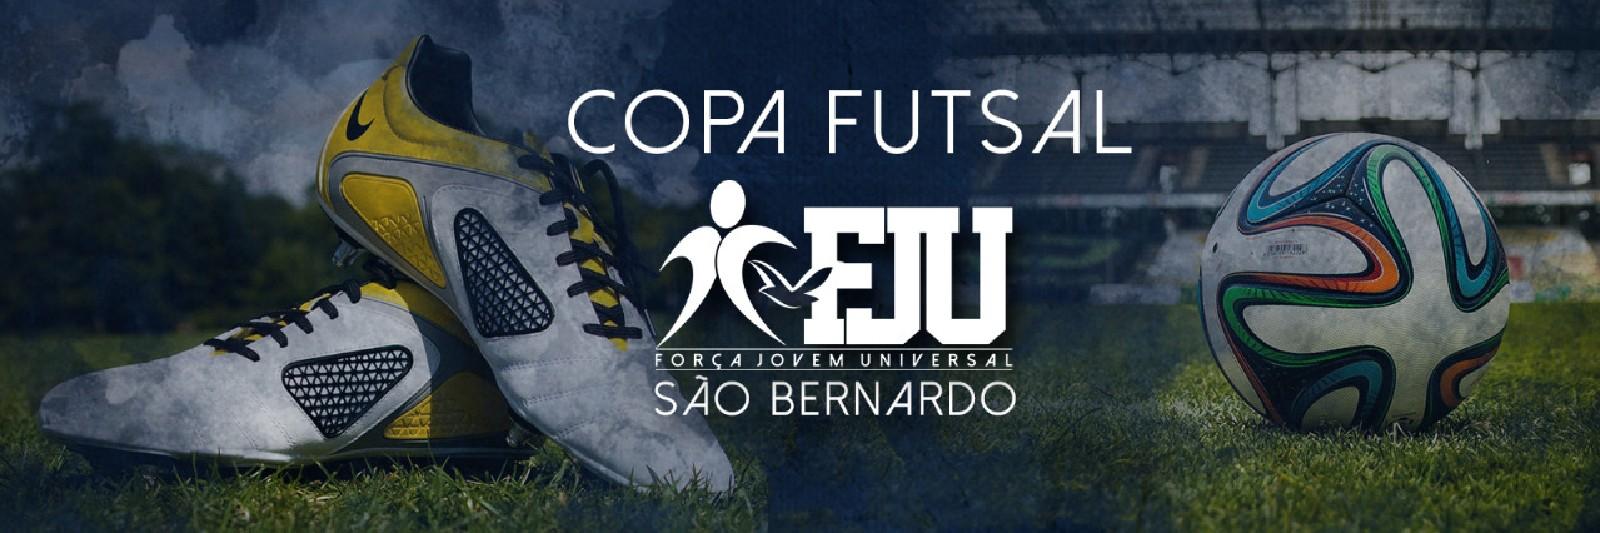 Copa Futsal FJU SBC